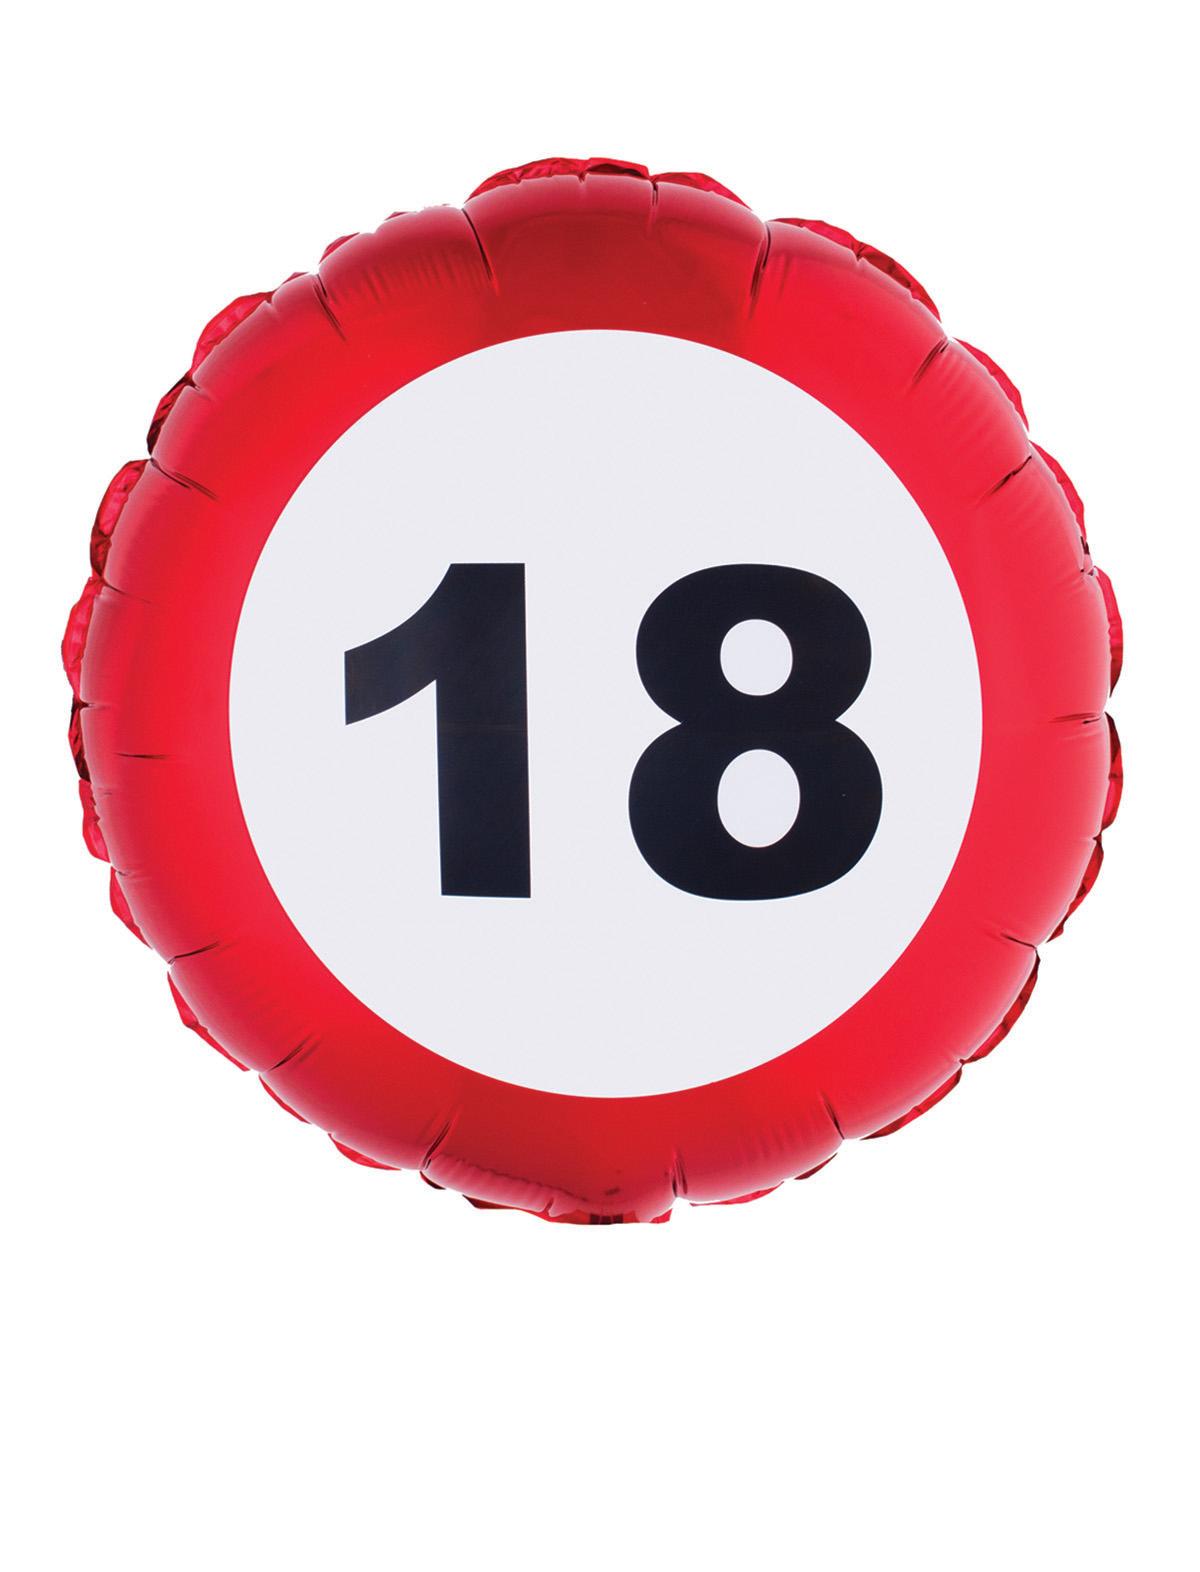 Folienballon Geburtstag 18-80 Geburtstag 18